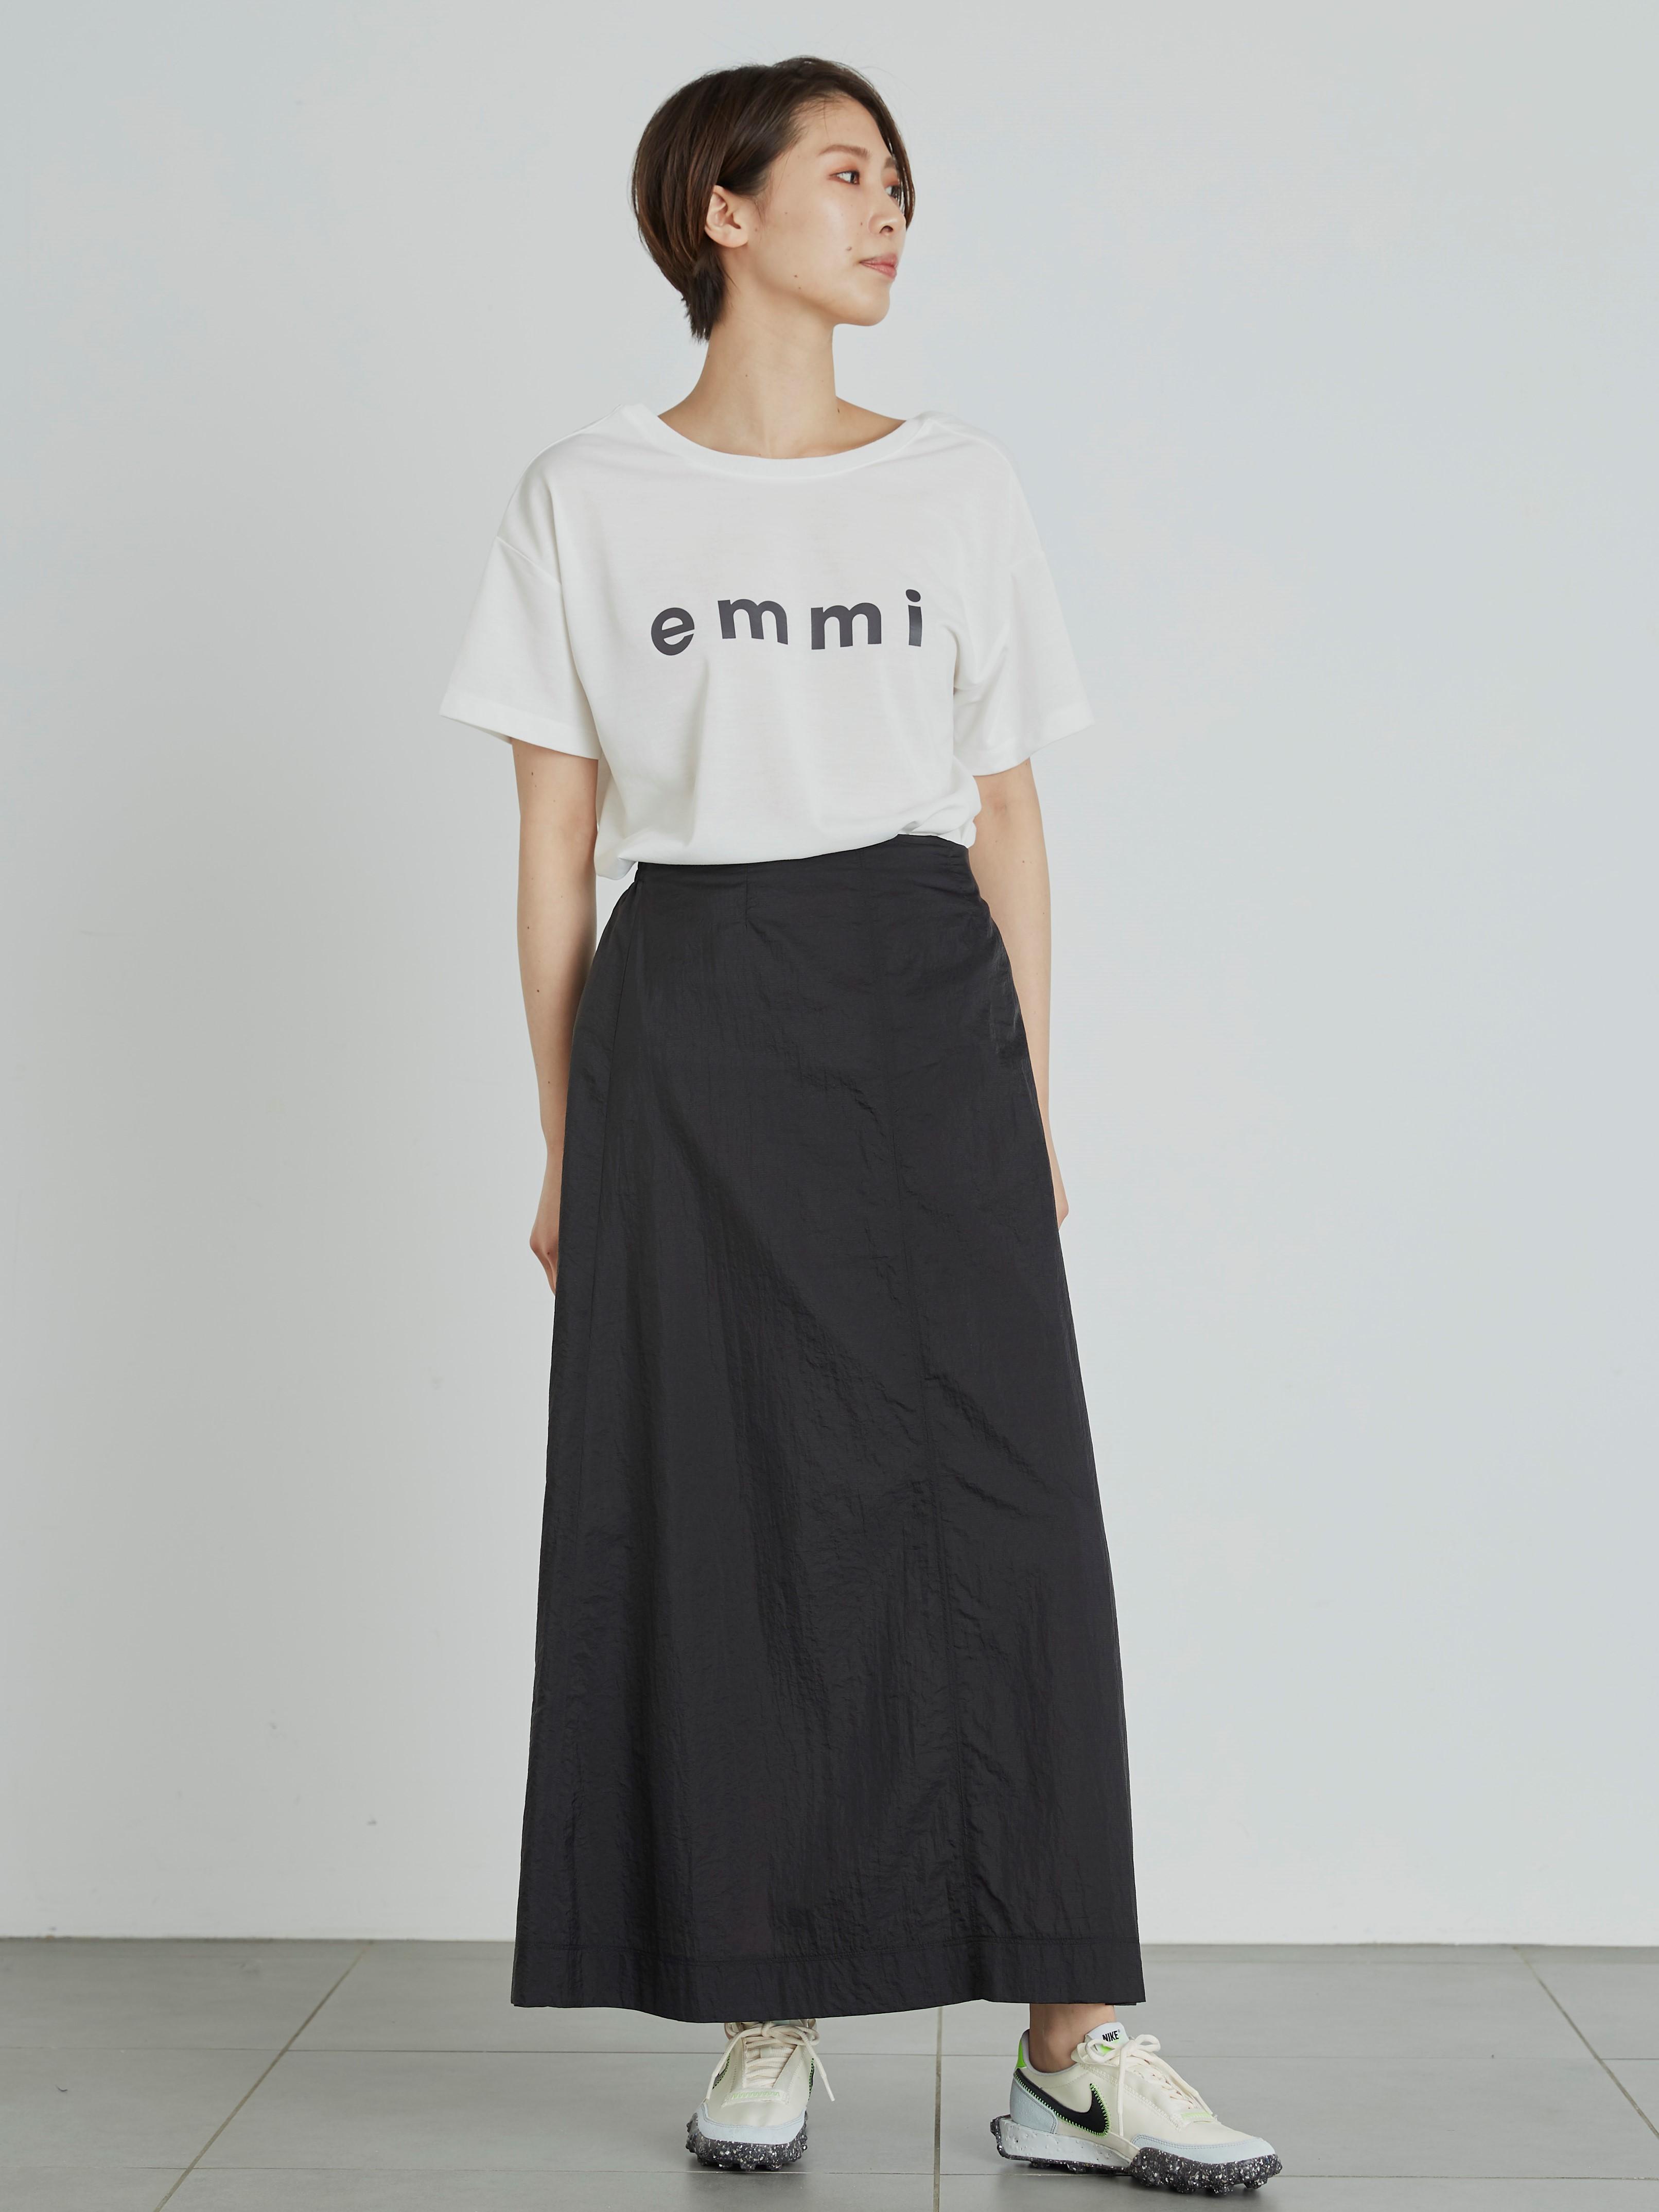 【emmi atelier】pocketableスカート(BLK-F)